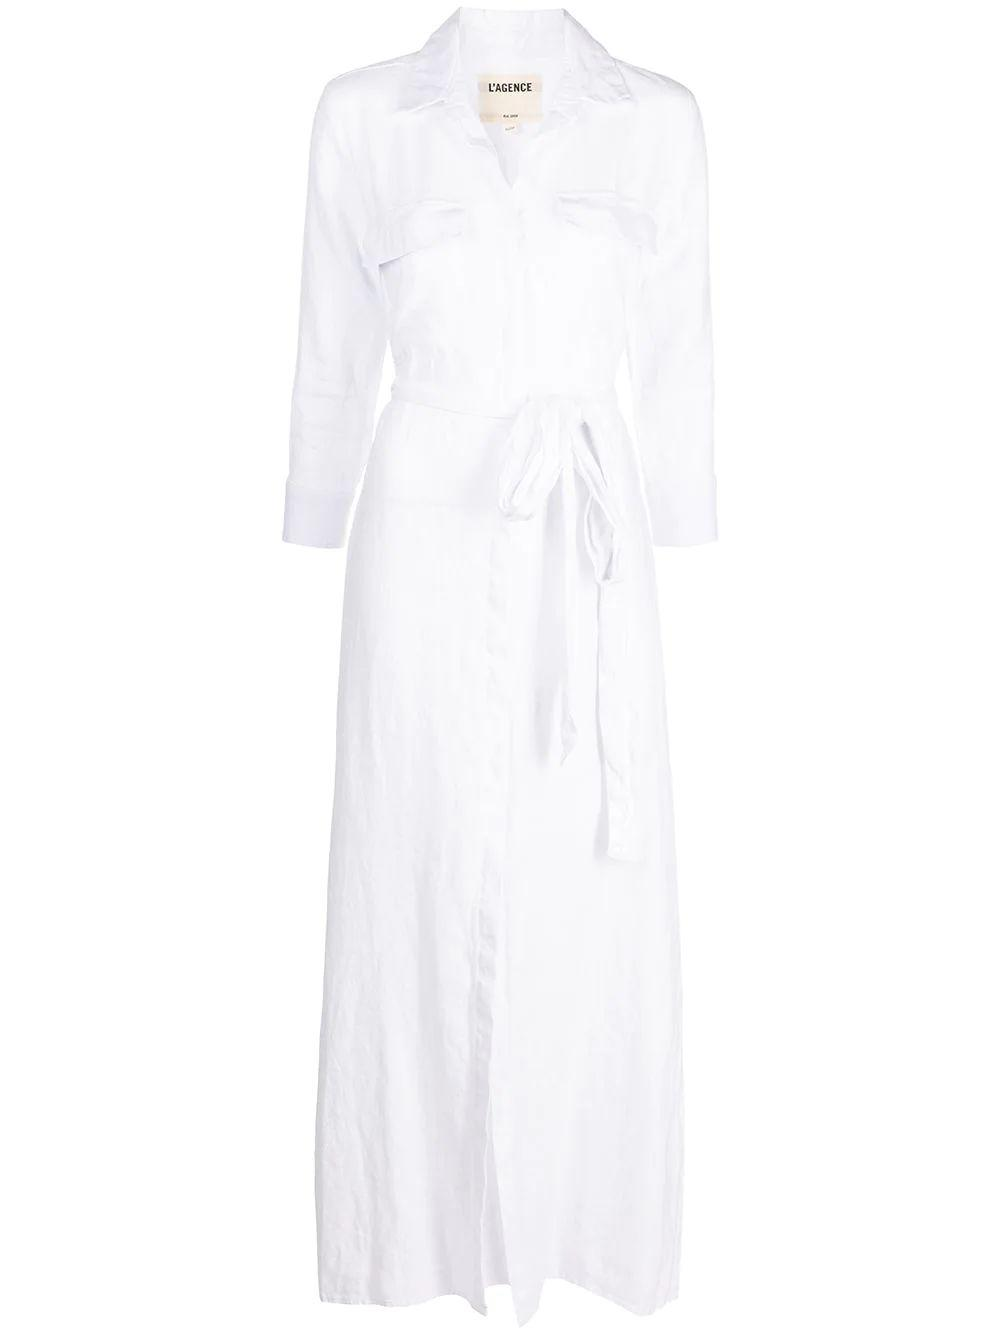 Cameron Long Shirt Dress Item # 60466FLI